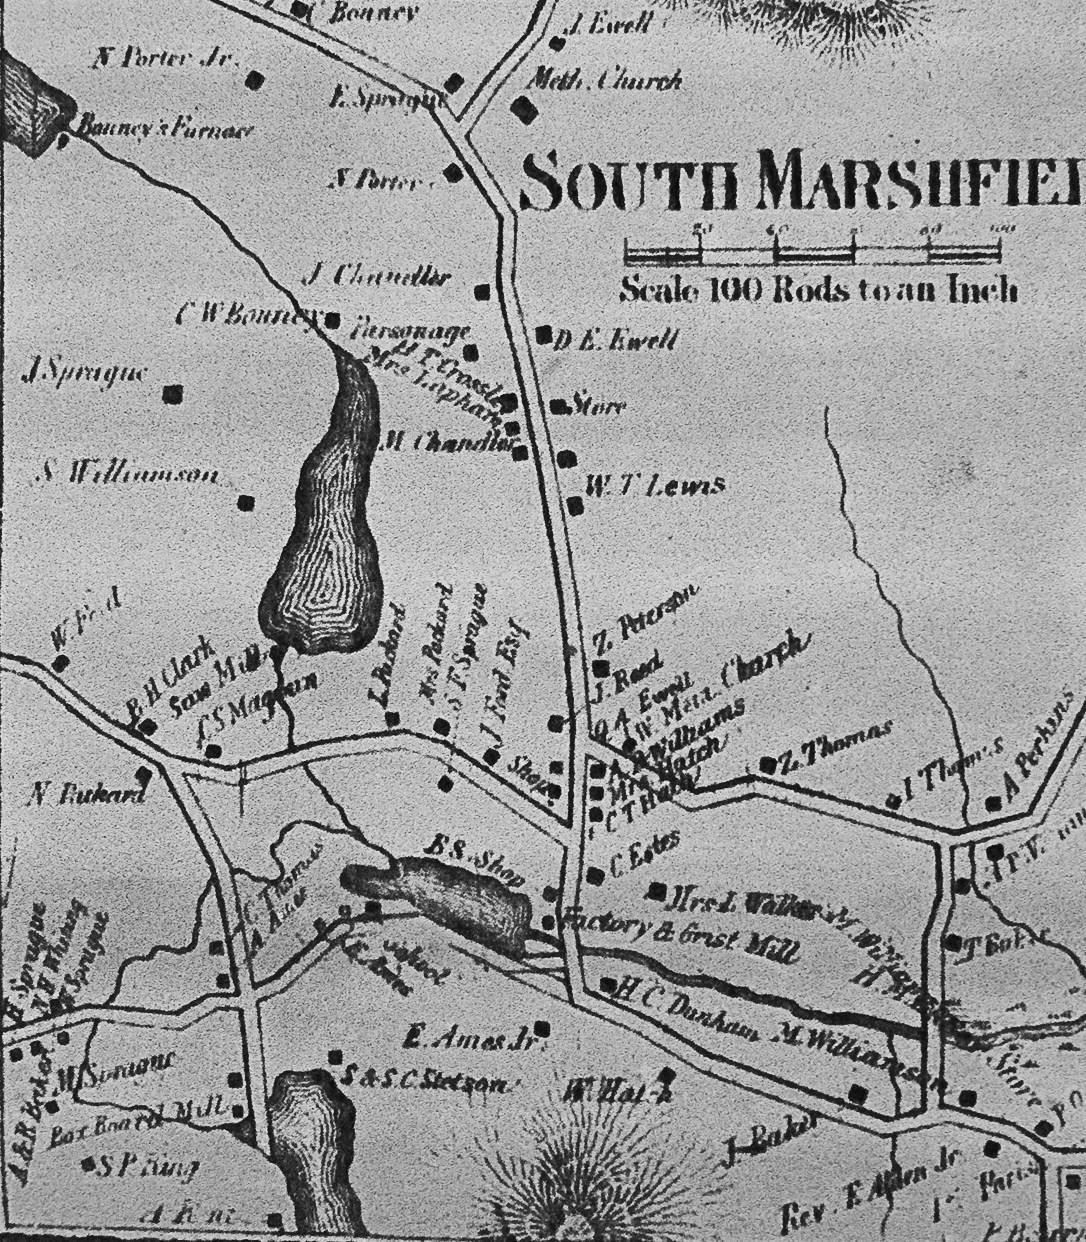 Swingers in north marshfield massachusetts